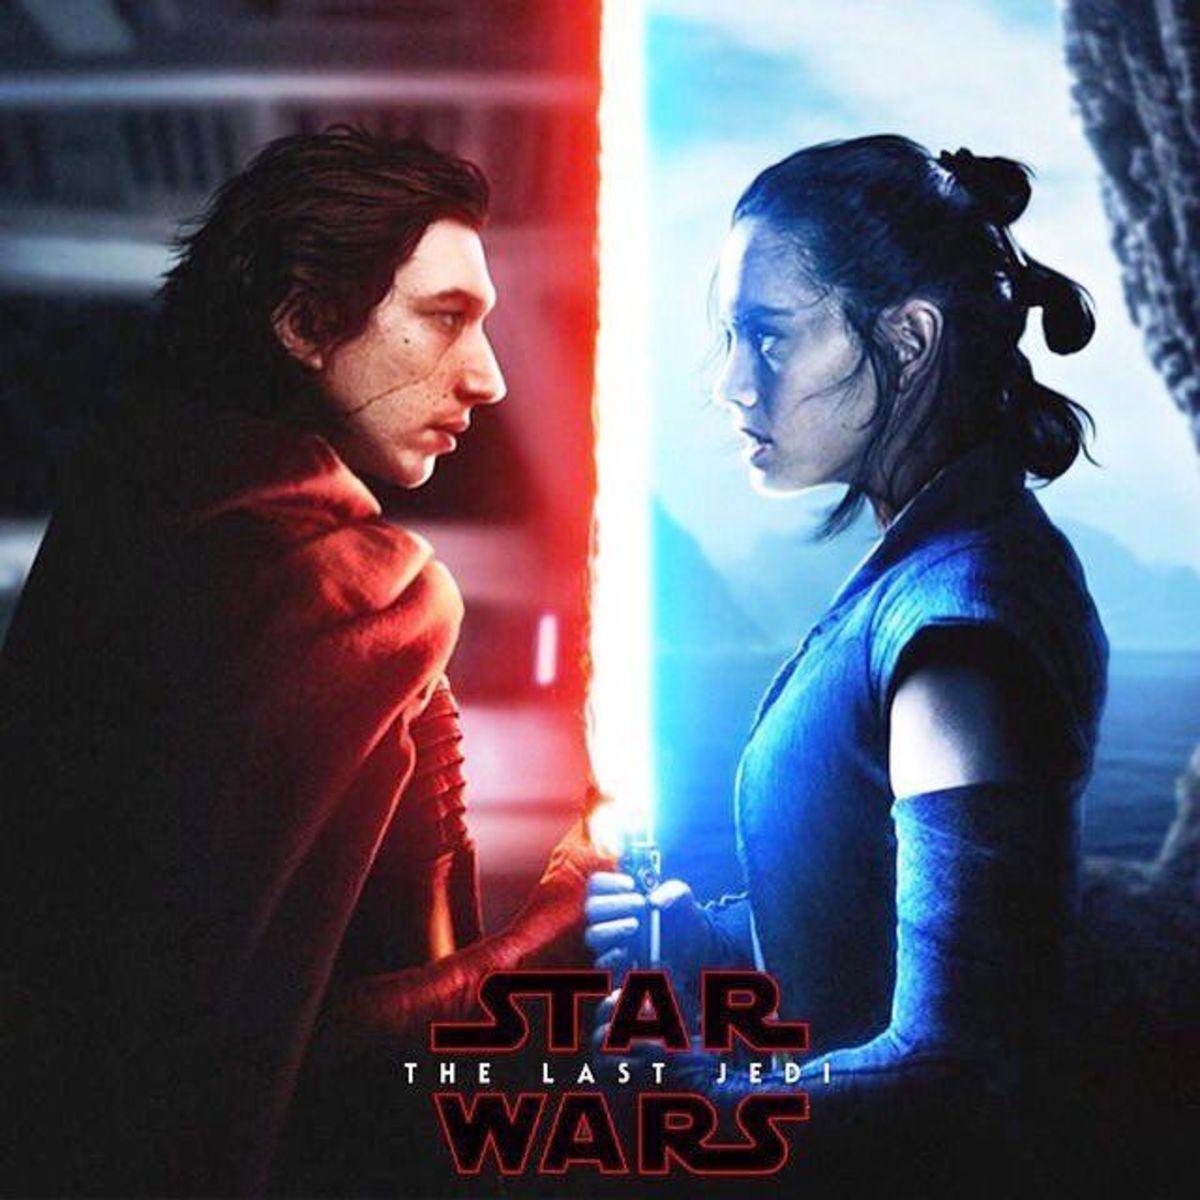 Reylo in Star Wars: The Last Jedi